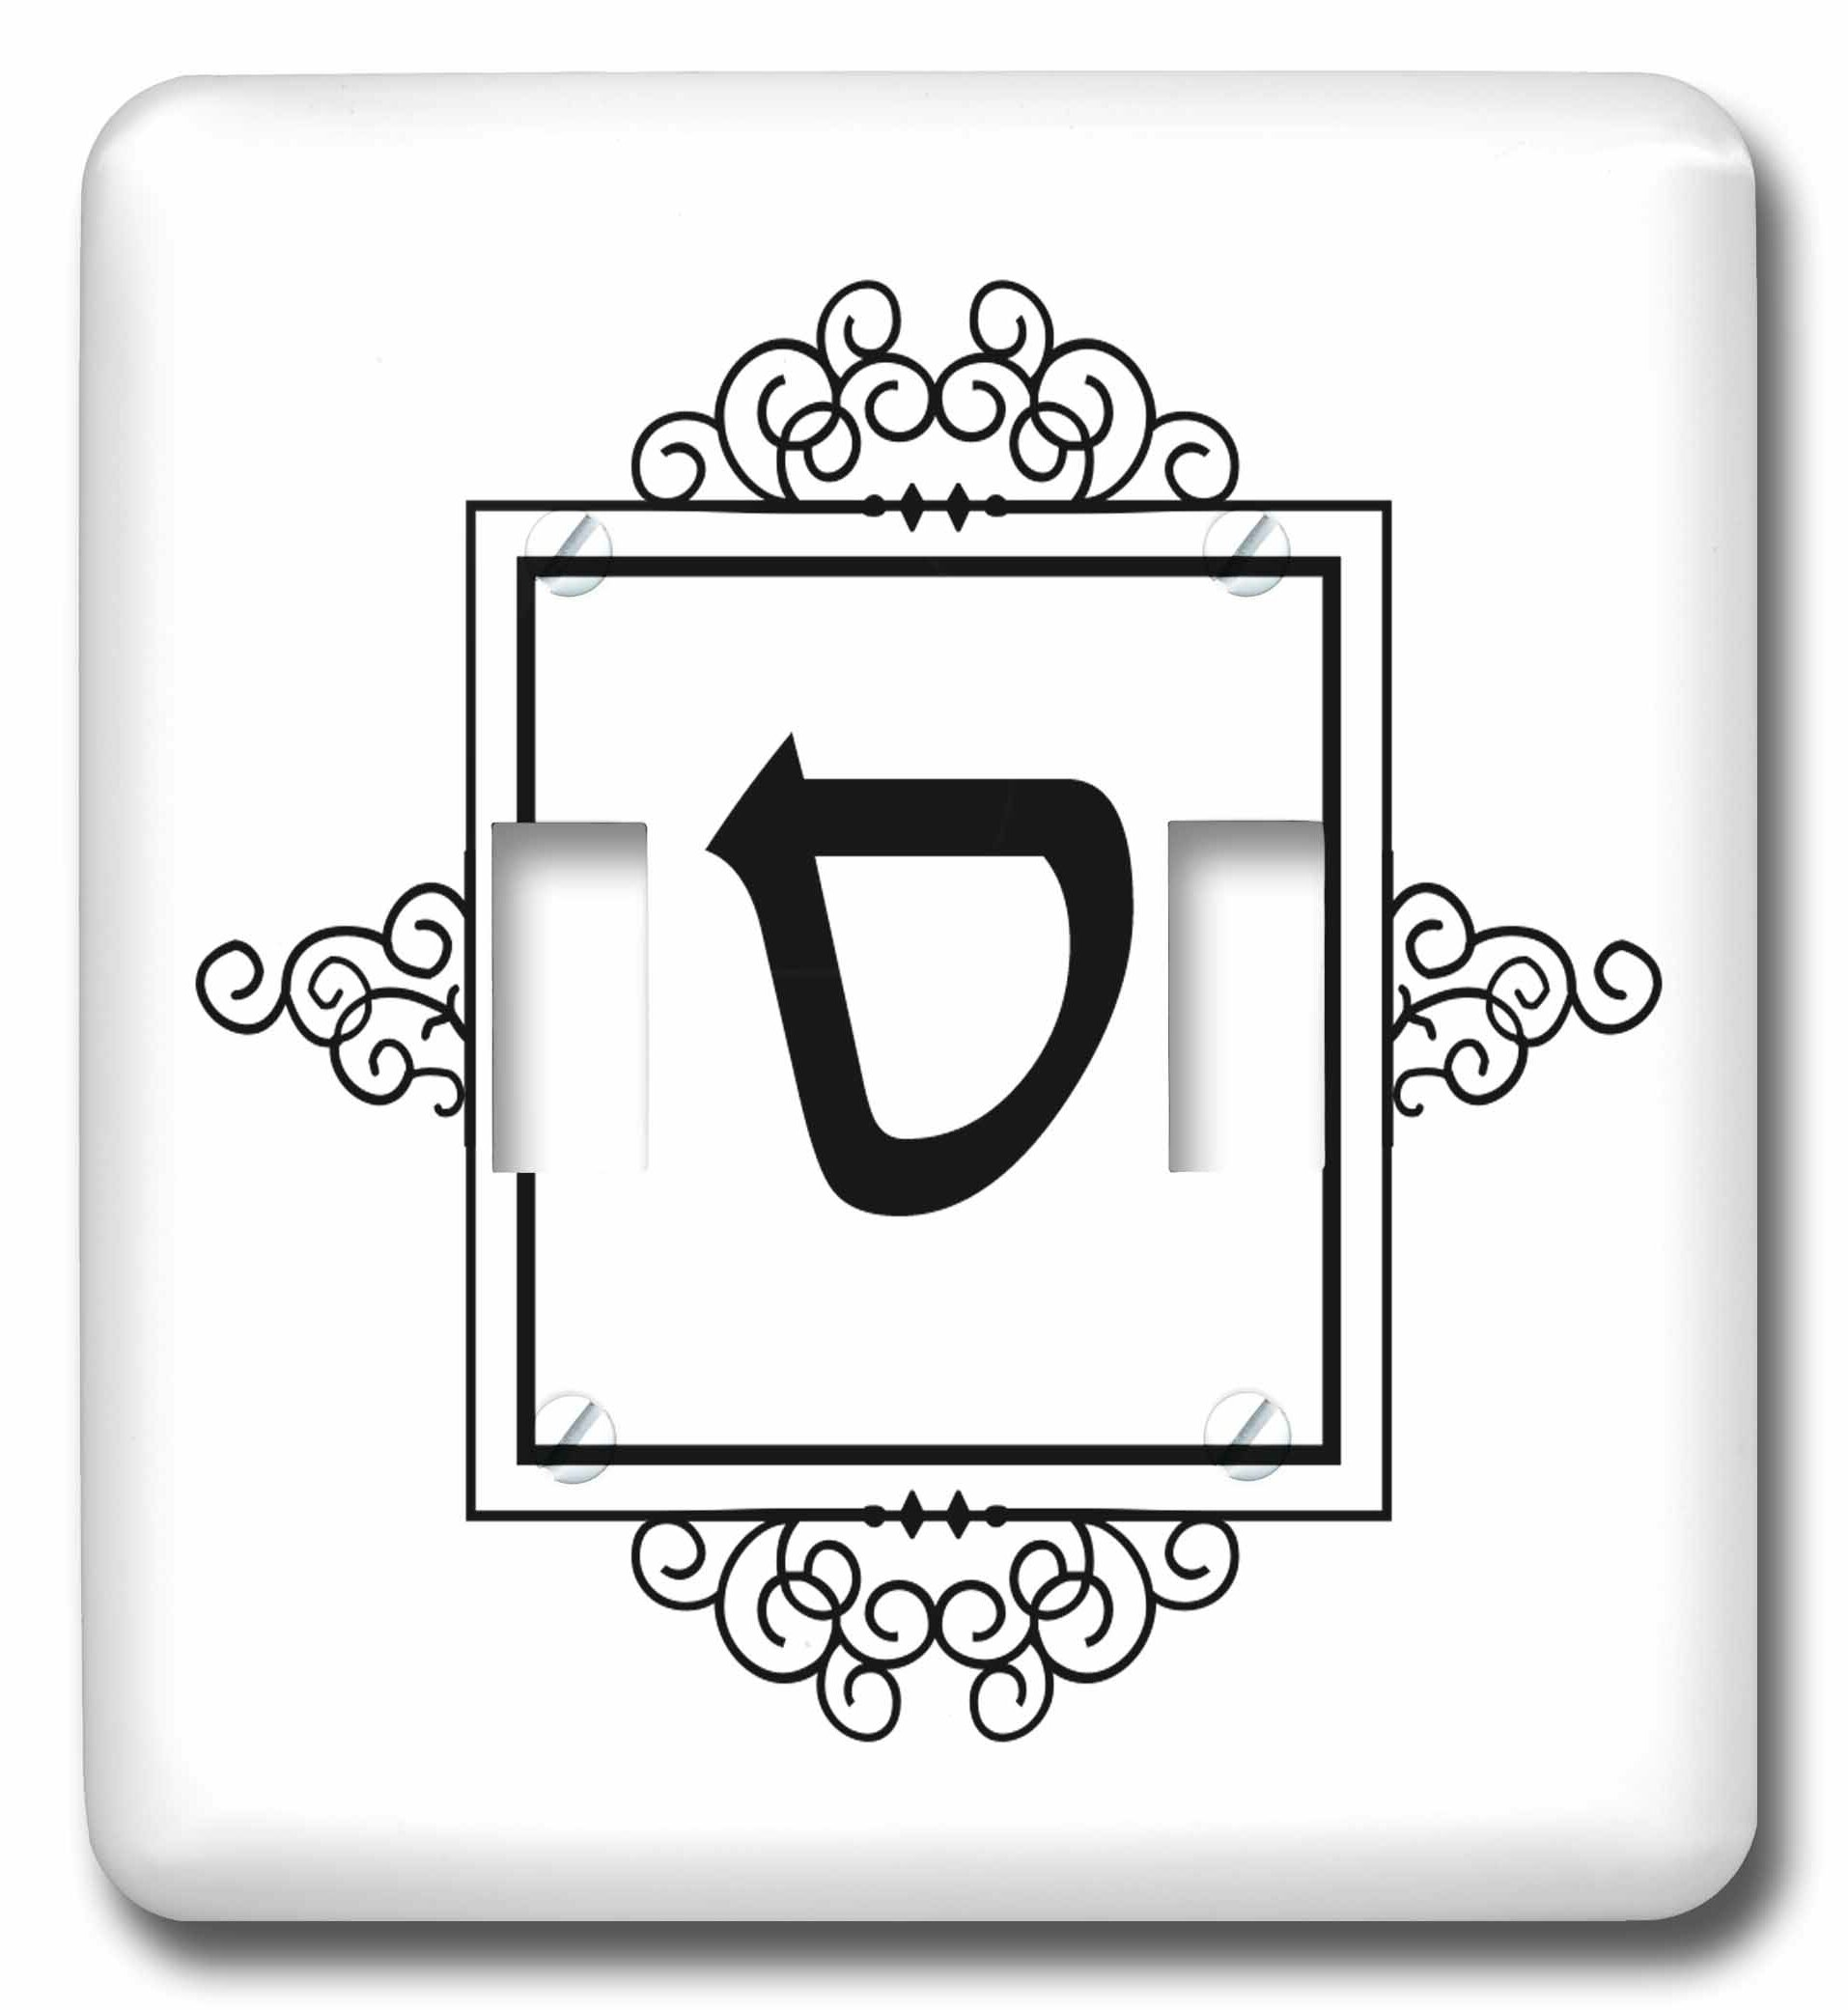 3drose Samech Hebrew Alphabet Monogram For Letter S Ivrit Initial 2 Gang Toggle Light Switch Wall Plate Wayfair